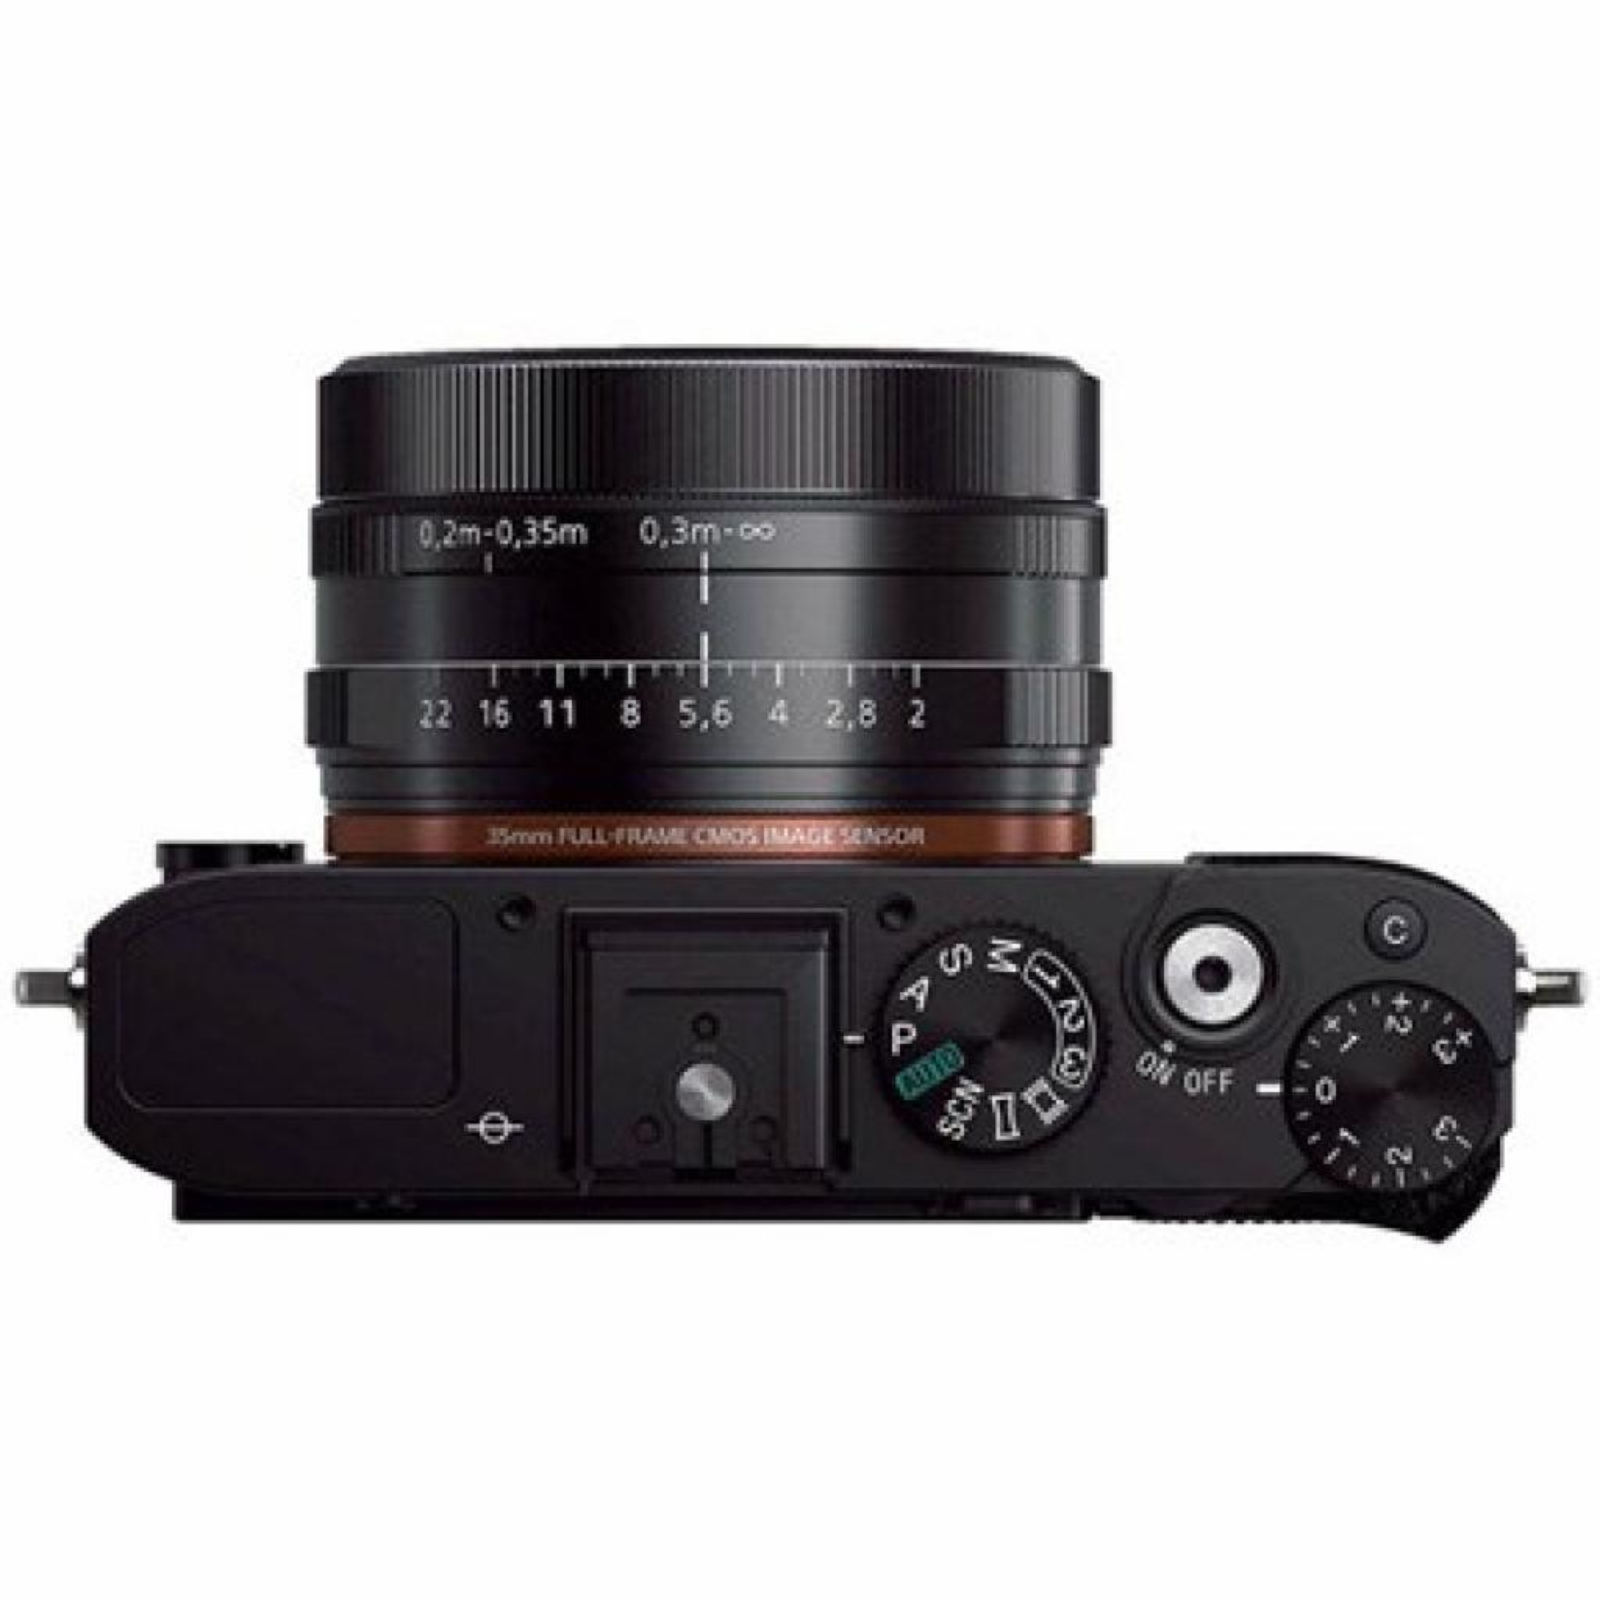 Цифровой фотоаппарат SONY Cyber-shot DSC-RX1R (DSCRX1R.CE3) изображение 3